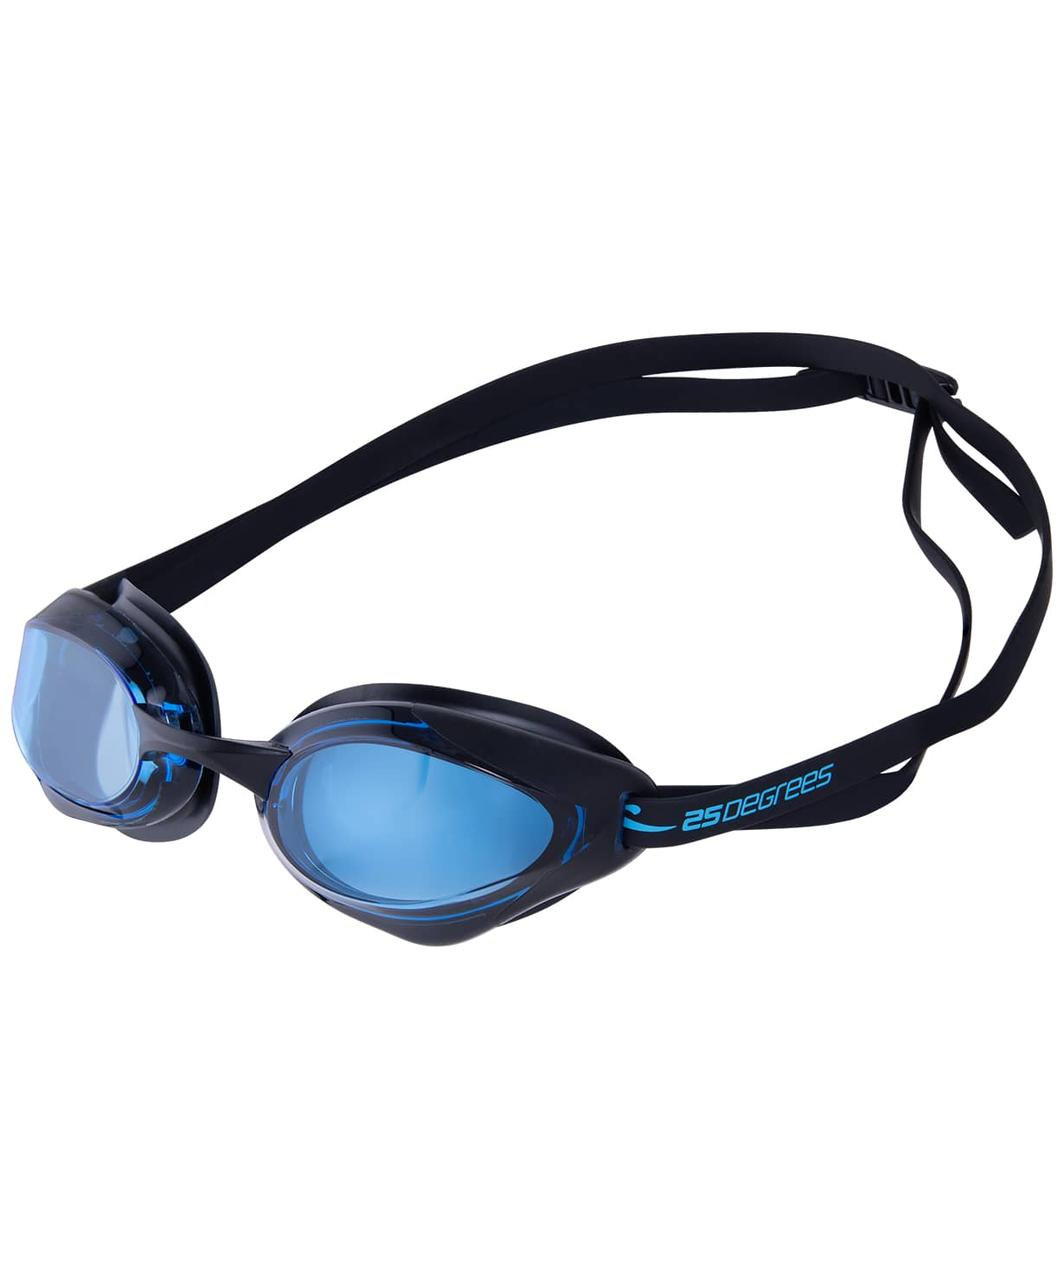 Очки для плавания Infase Black 25Degrees